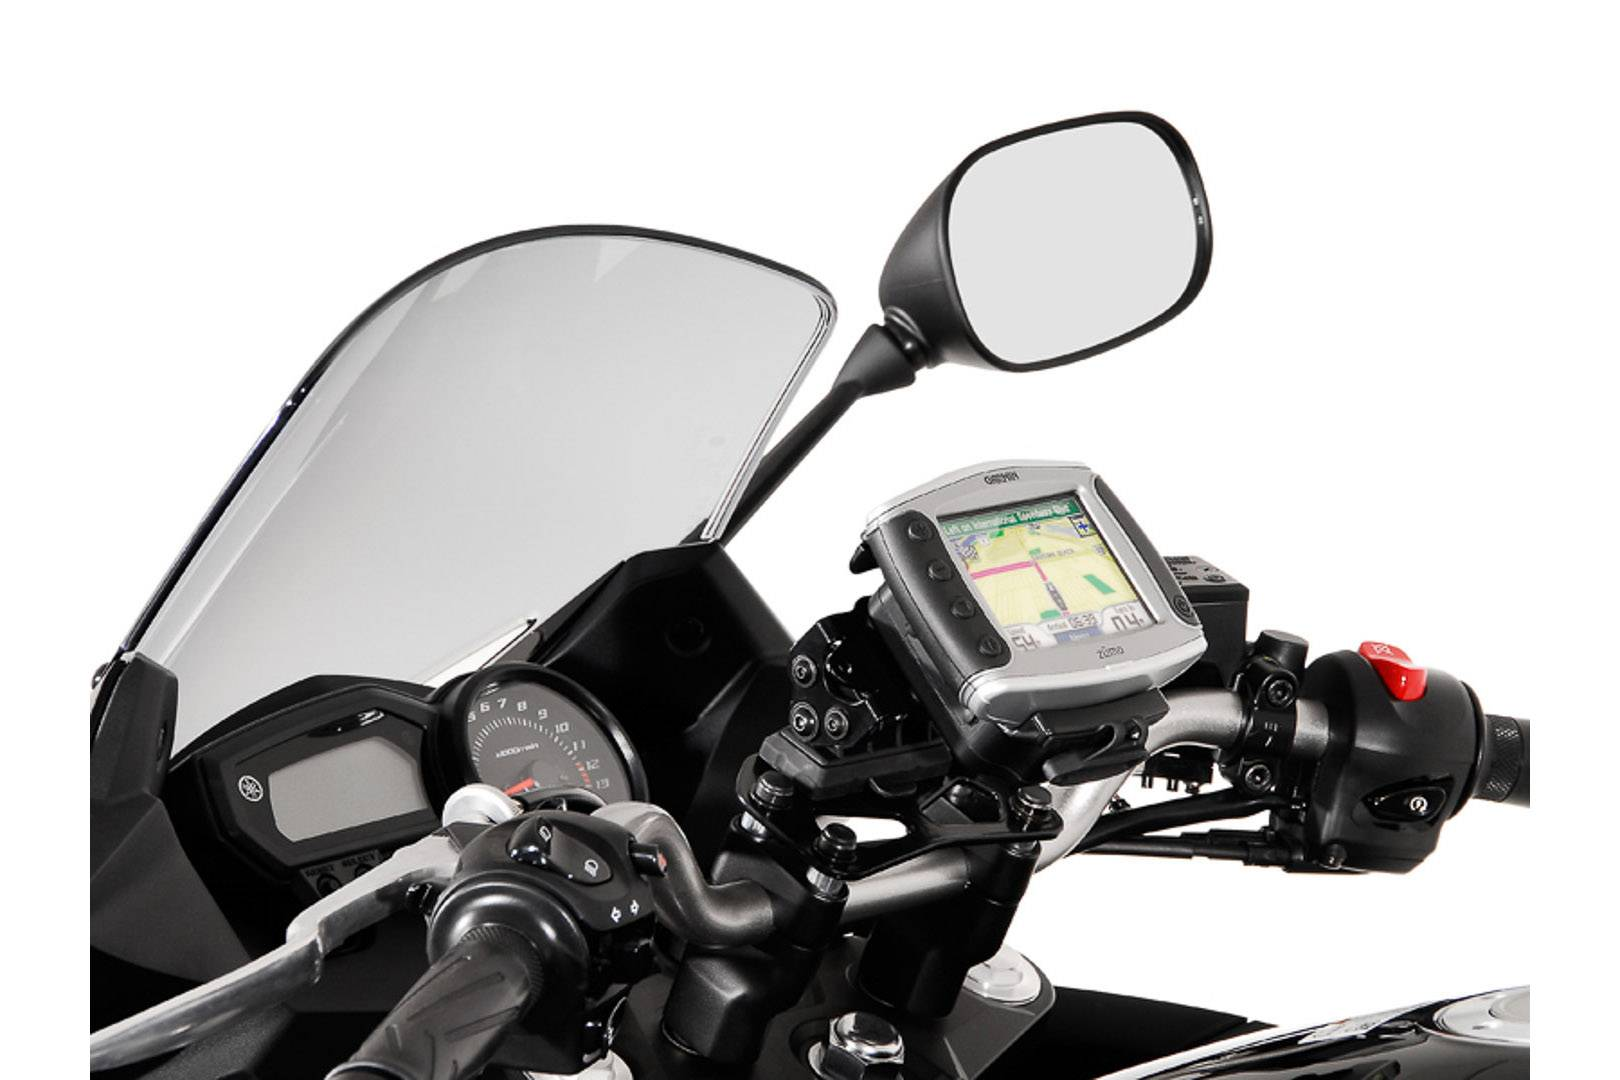 SW-Motech Honda/ Triumph/ Yamaha Montaggio GPS per Manubrio (nero)